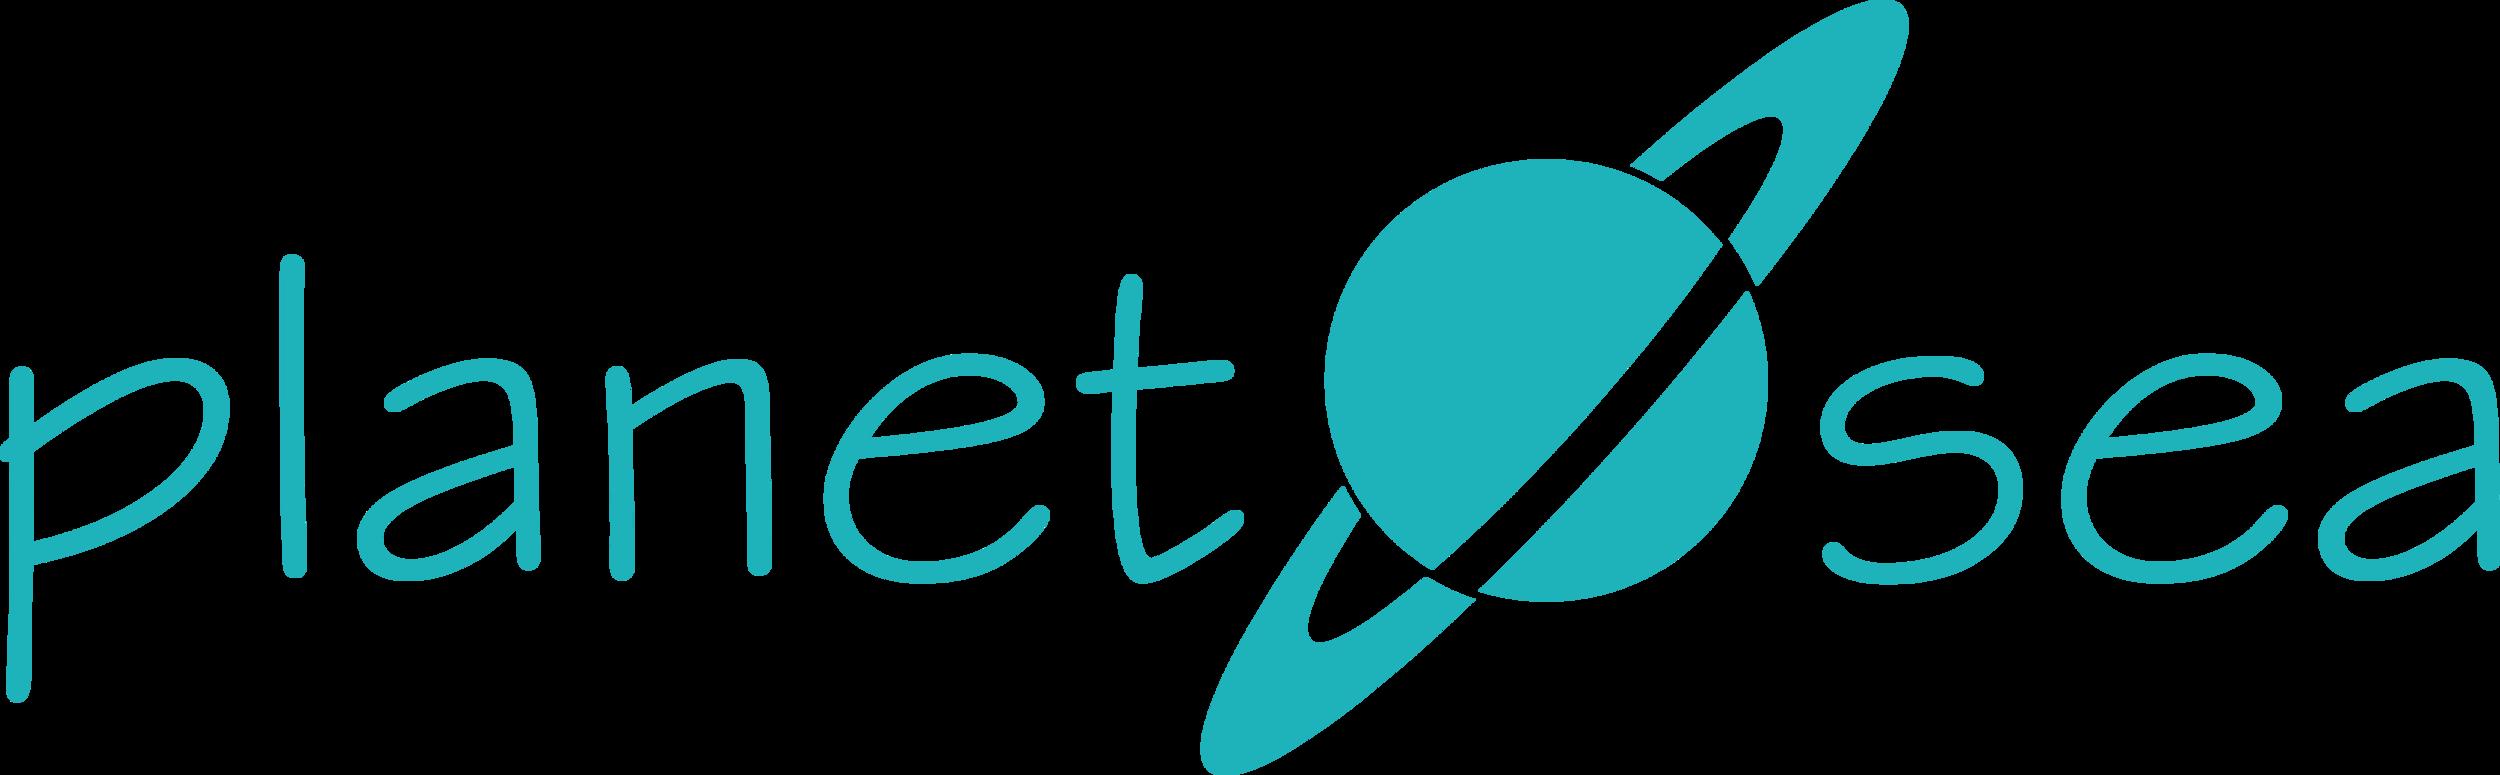 planet sea logo vector_teal_transparent.png